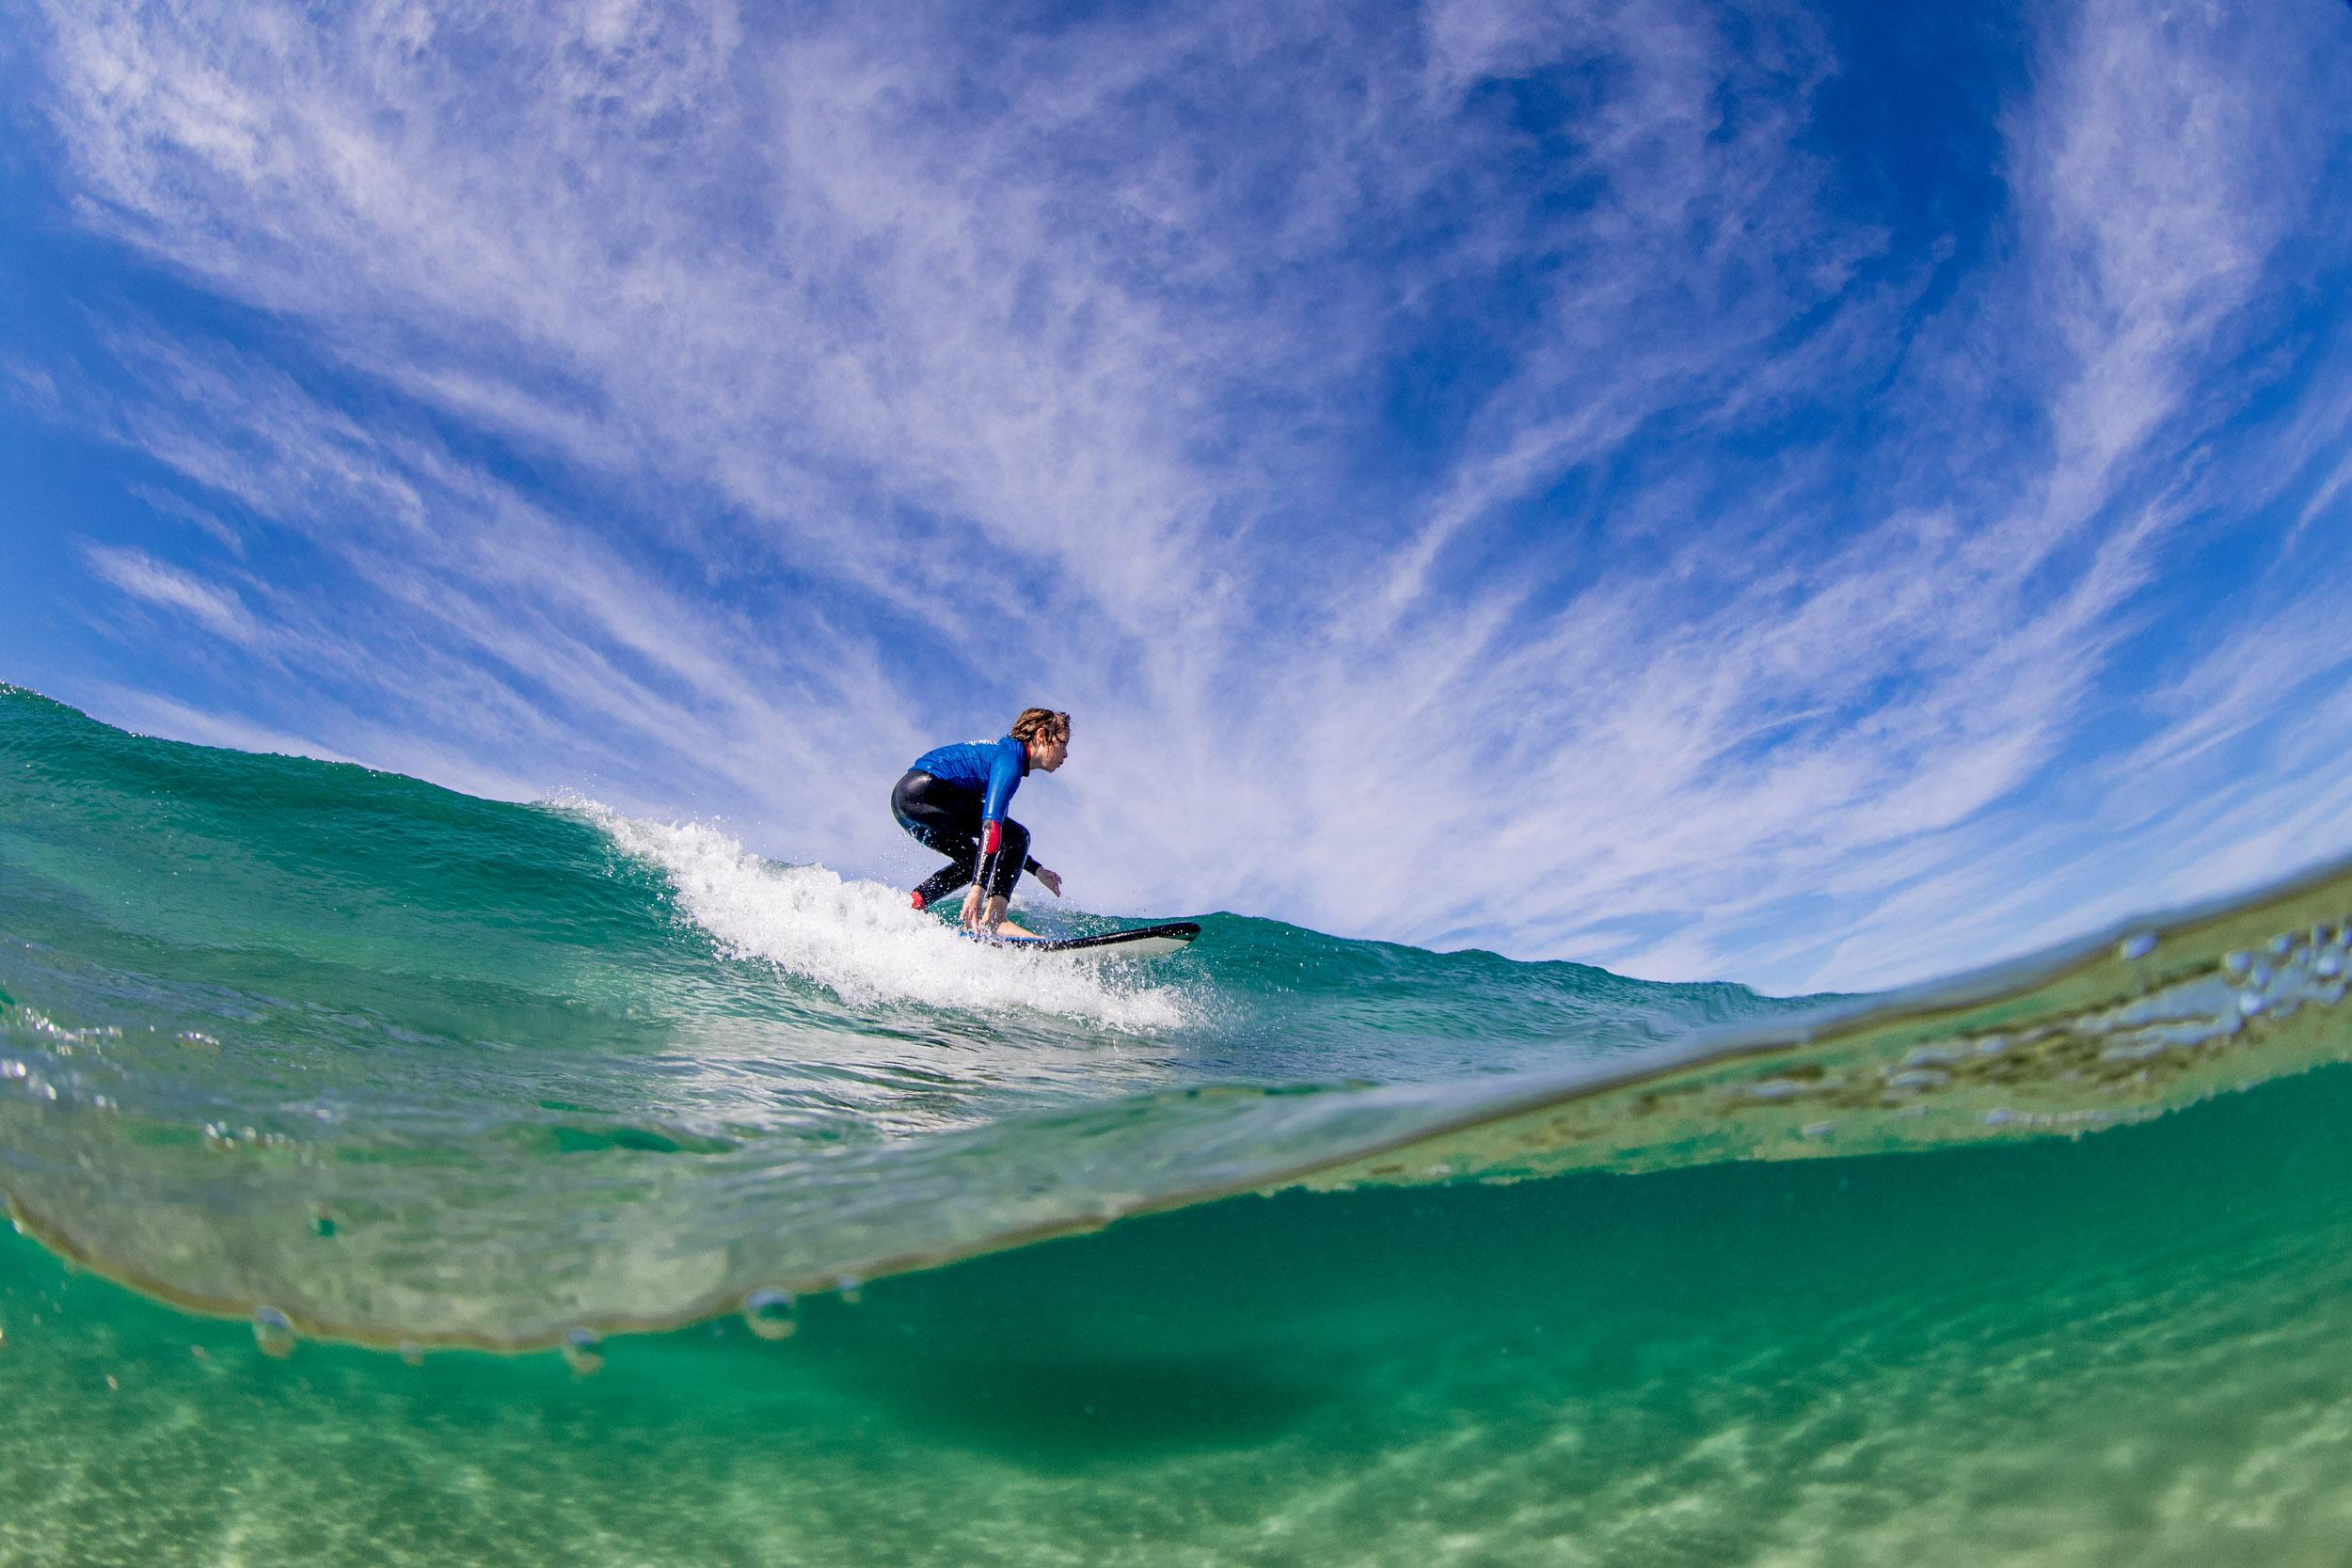 surfing-australia-surf-groms-photography-SGWB-909.jpg